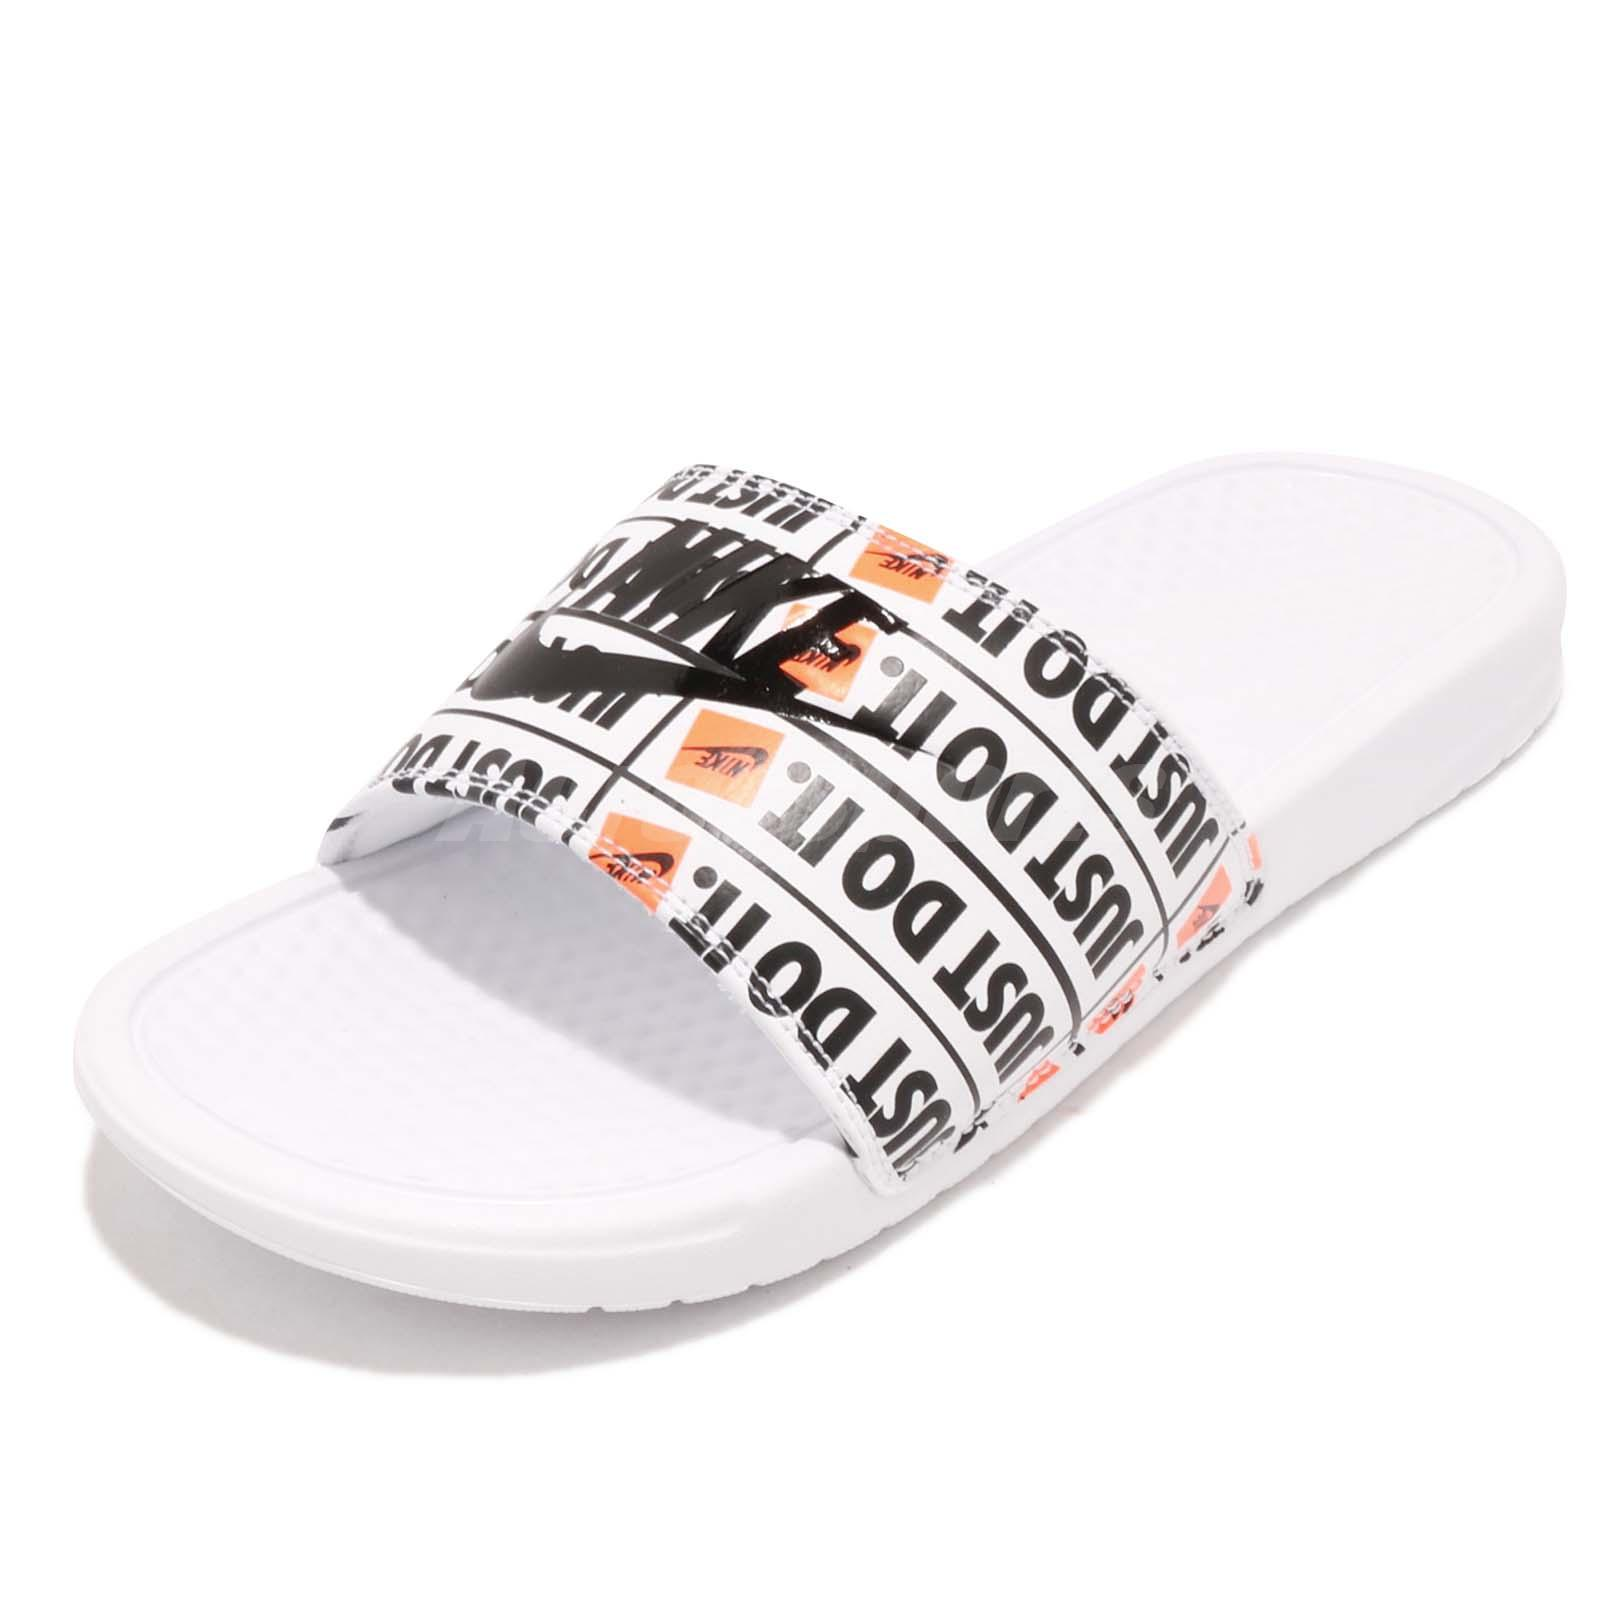 ce6be81b5bf5 Nike Benassi JDI Print Just Do It White Black Men Sports Sandals 631261-102